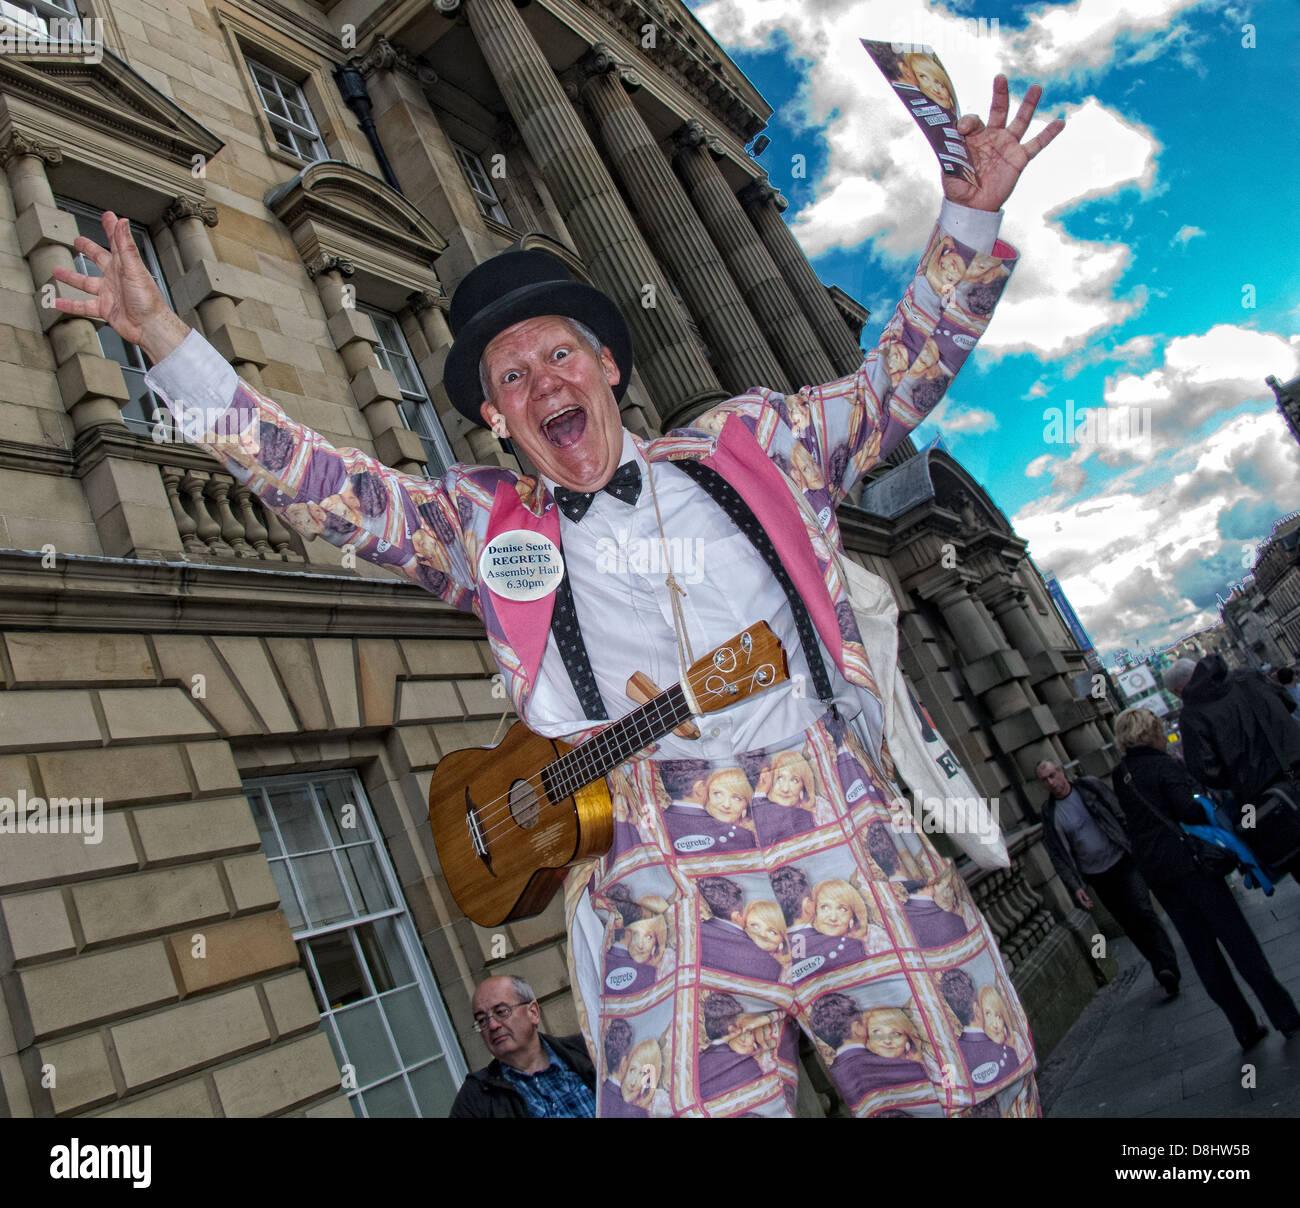 Laden Sie dieses Alamy Stockfoto Edinburgh Festival Fringe handeln, Schottland, UK, EH1 1QS - D8HW5B